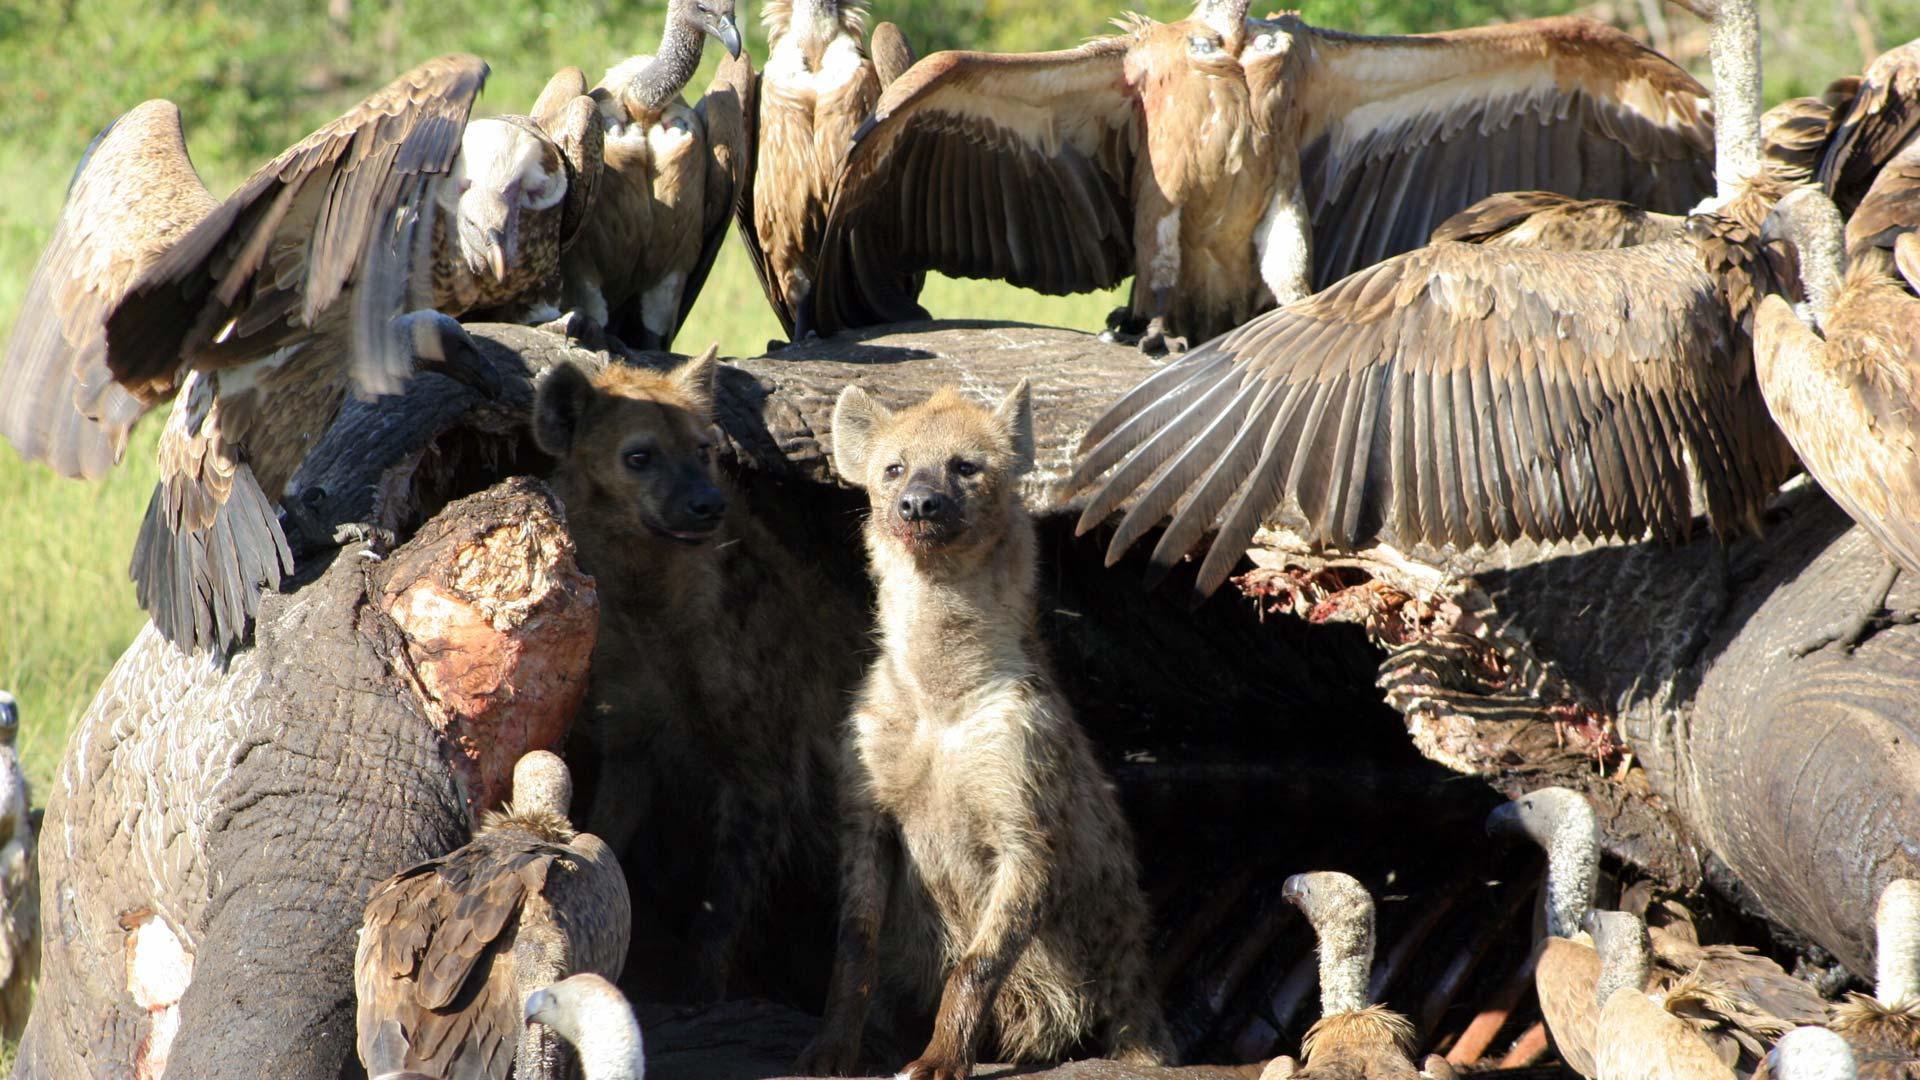 Hyena and vultures on elephant carcass